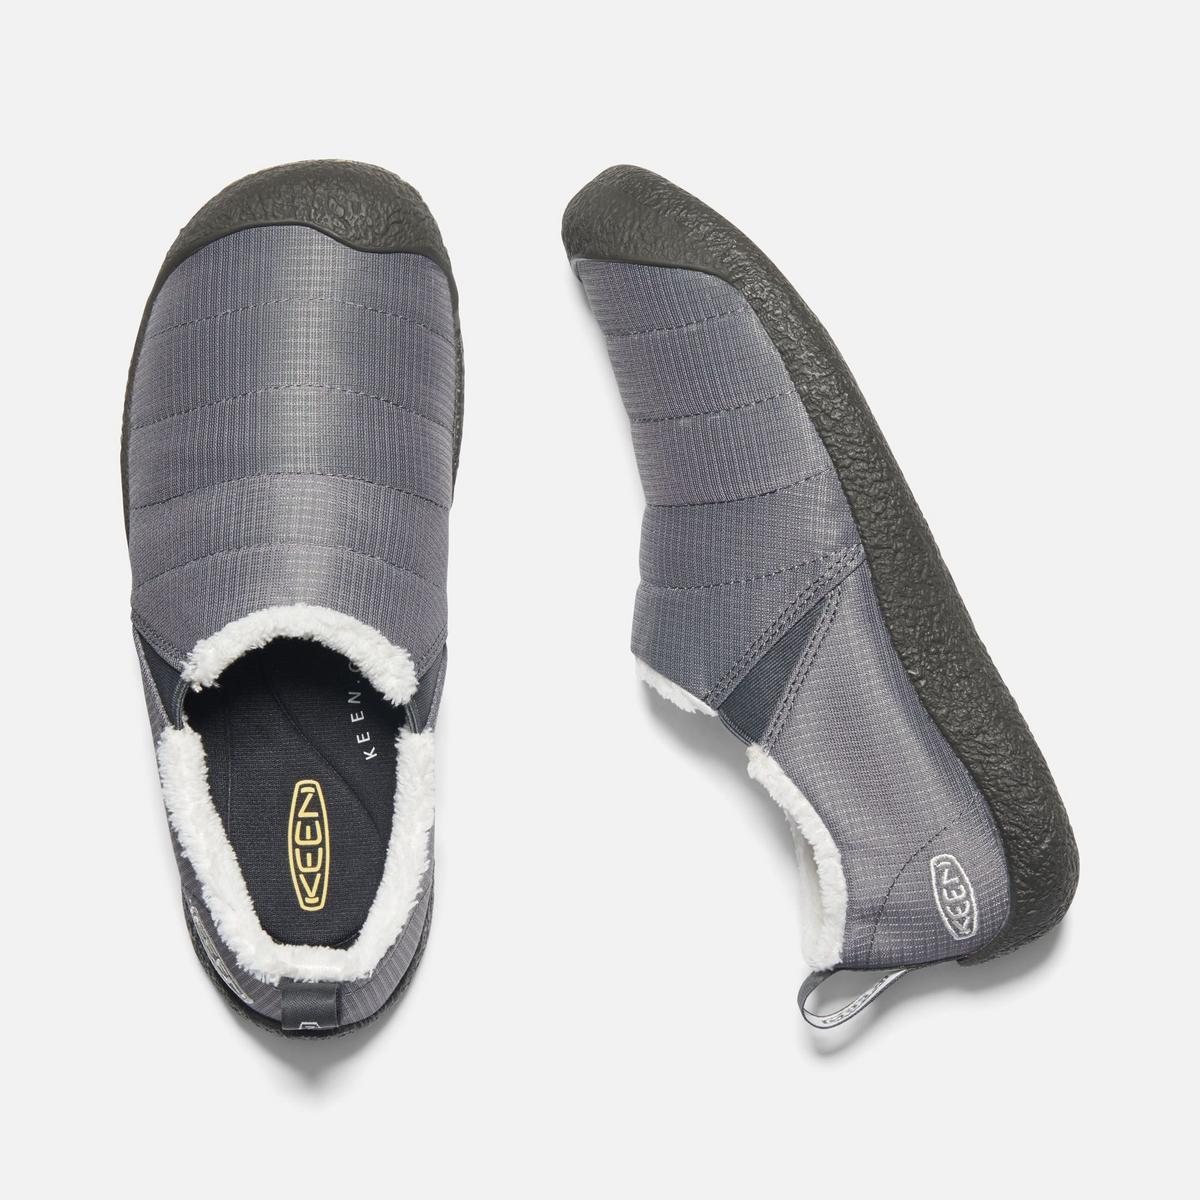 Keen Women's Keen Howser II Slipper - Grey